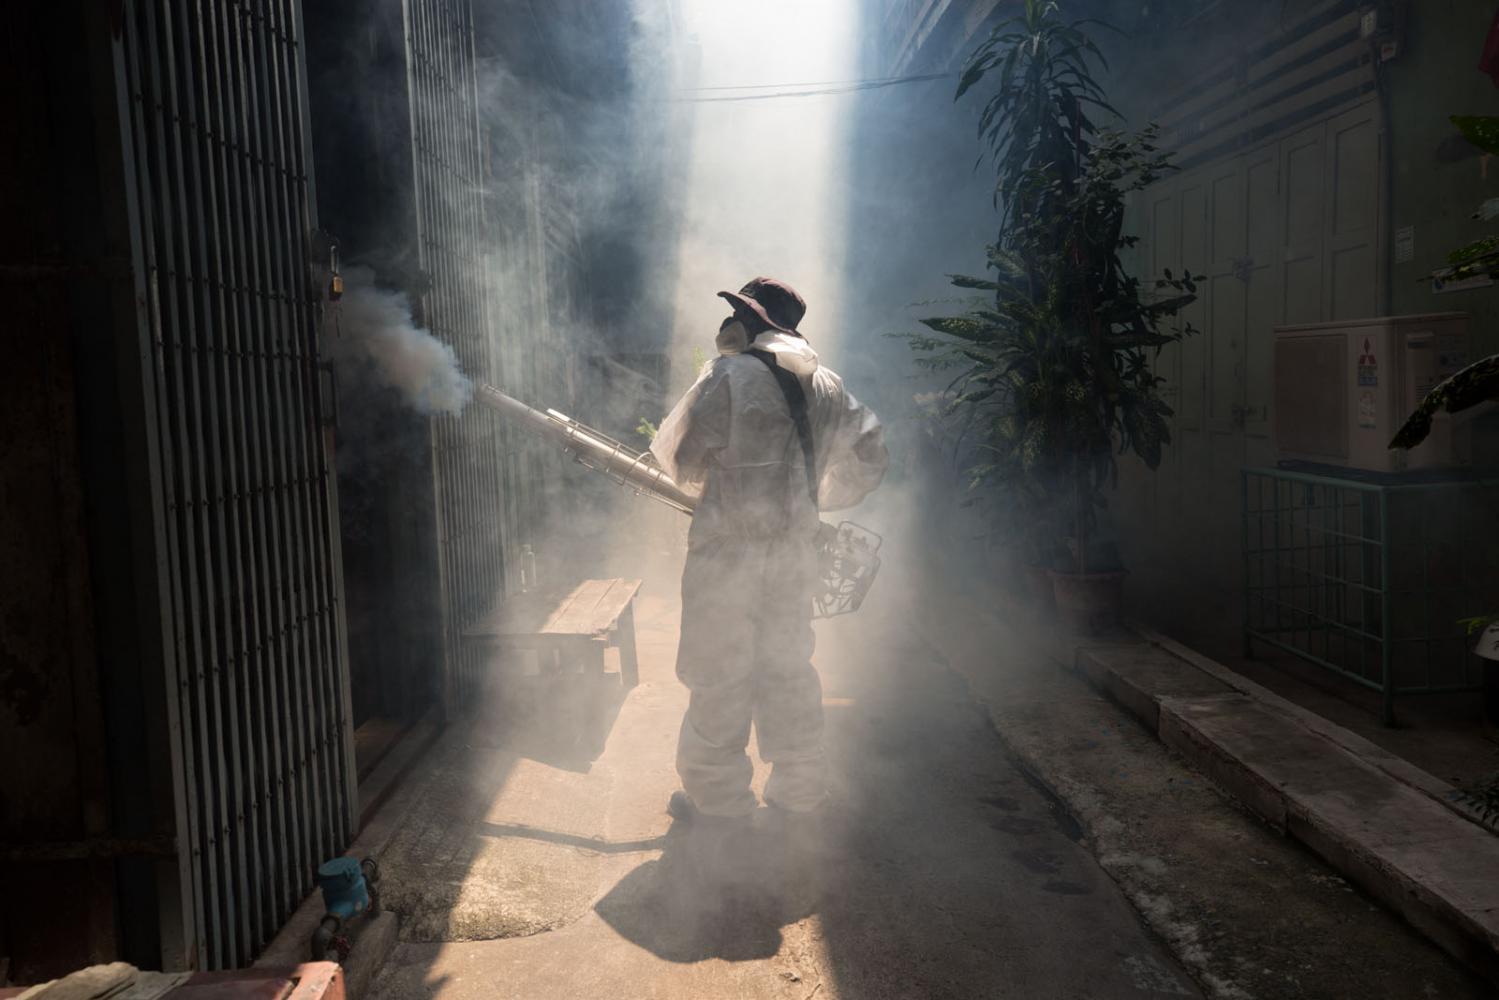 A worker from the Bangkok Metropolitan Administration (BMA) sprays a narrow street after a dengue fever outbreak. Bangkok, Thailand.